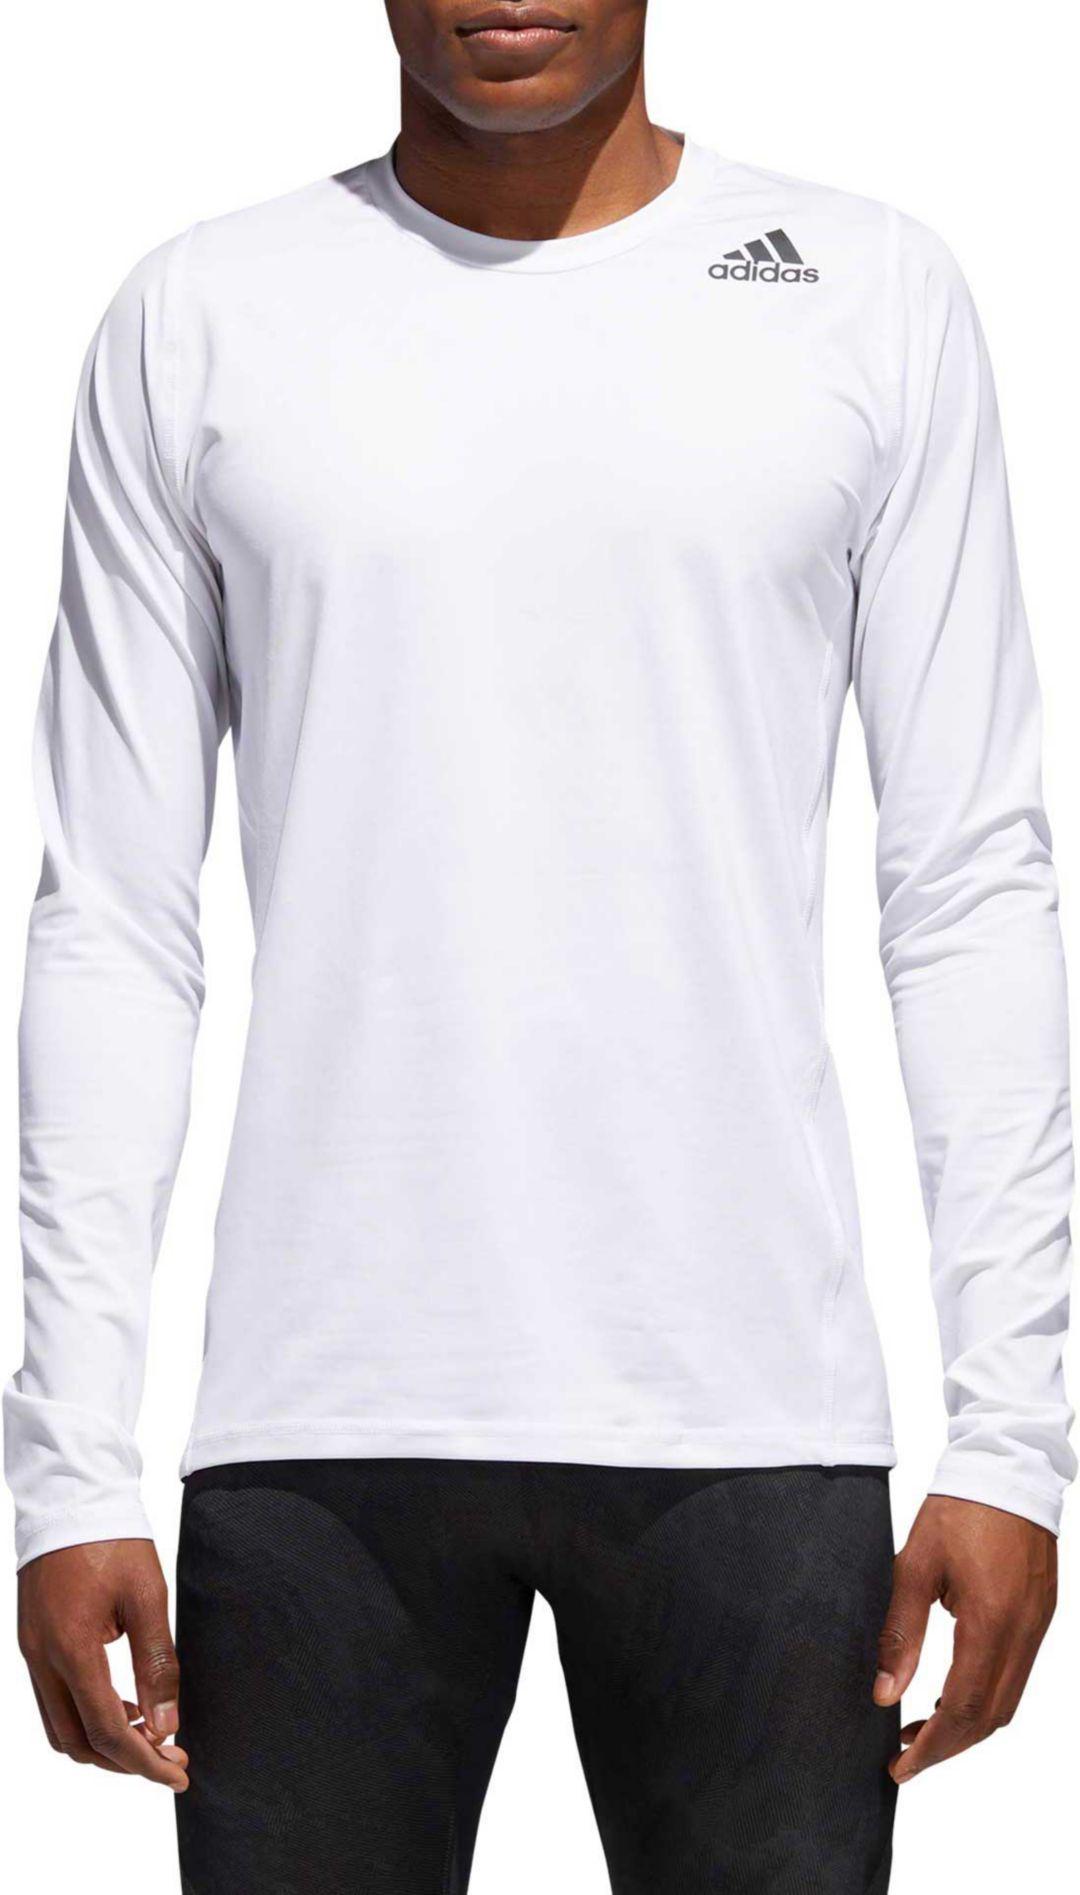 19856f3ba80c adidas Men's Alphaskin Sport Fitted Long Sleeve Training T-Shirt